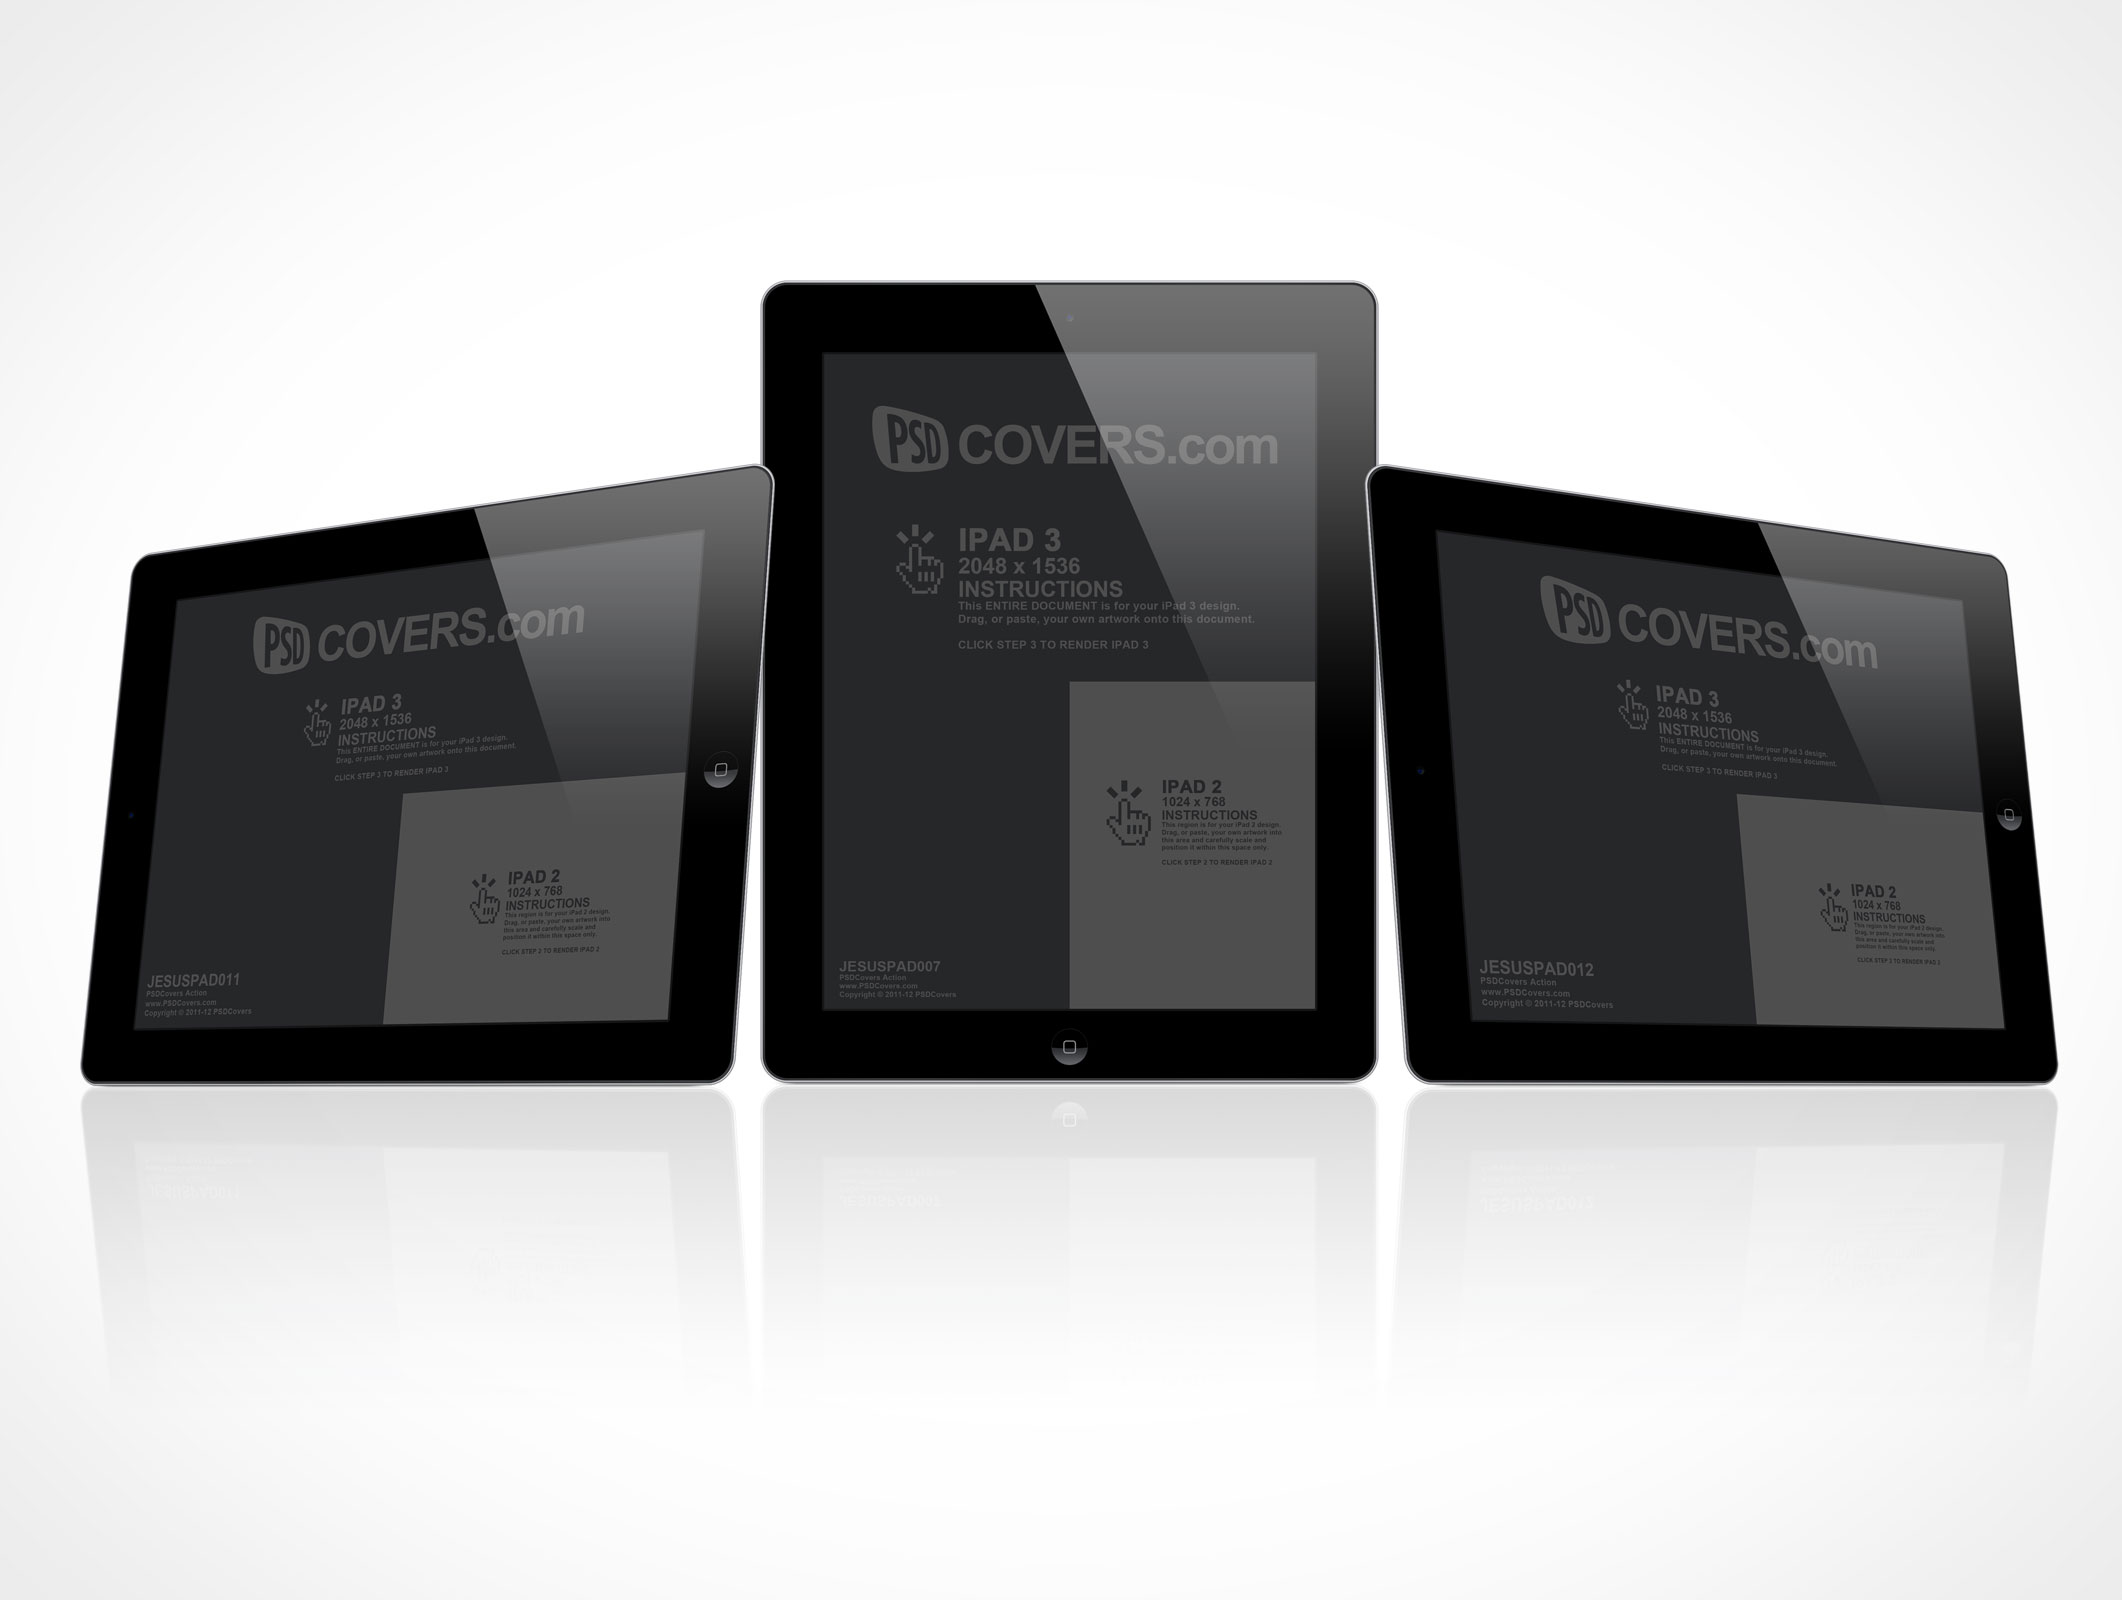 Apple New iPad 3 Retina Display